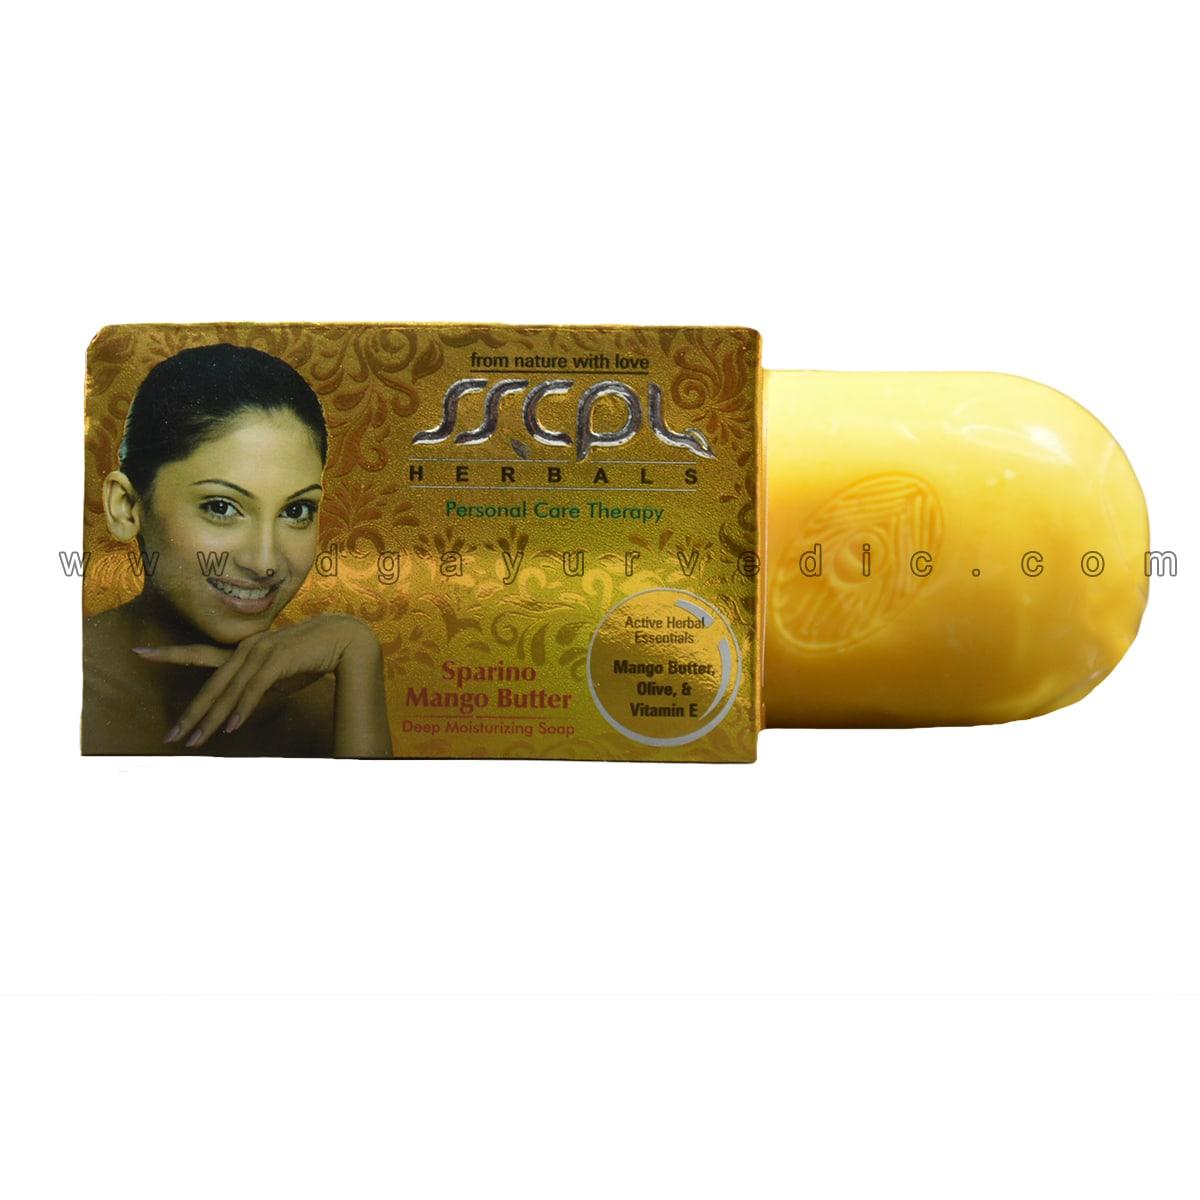 Sscpl Sparino Mango Butter Deep Moisturizing Soap 100 Gms